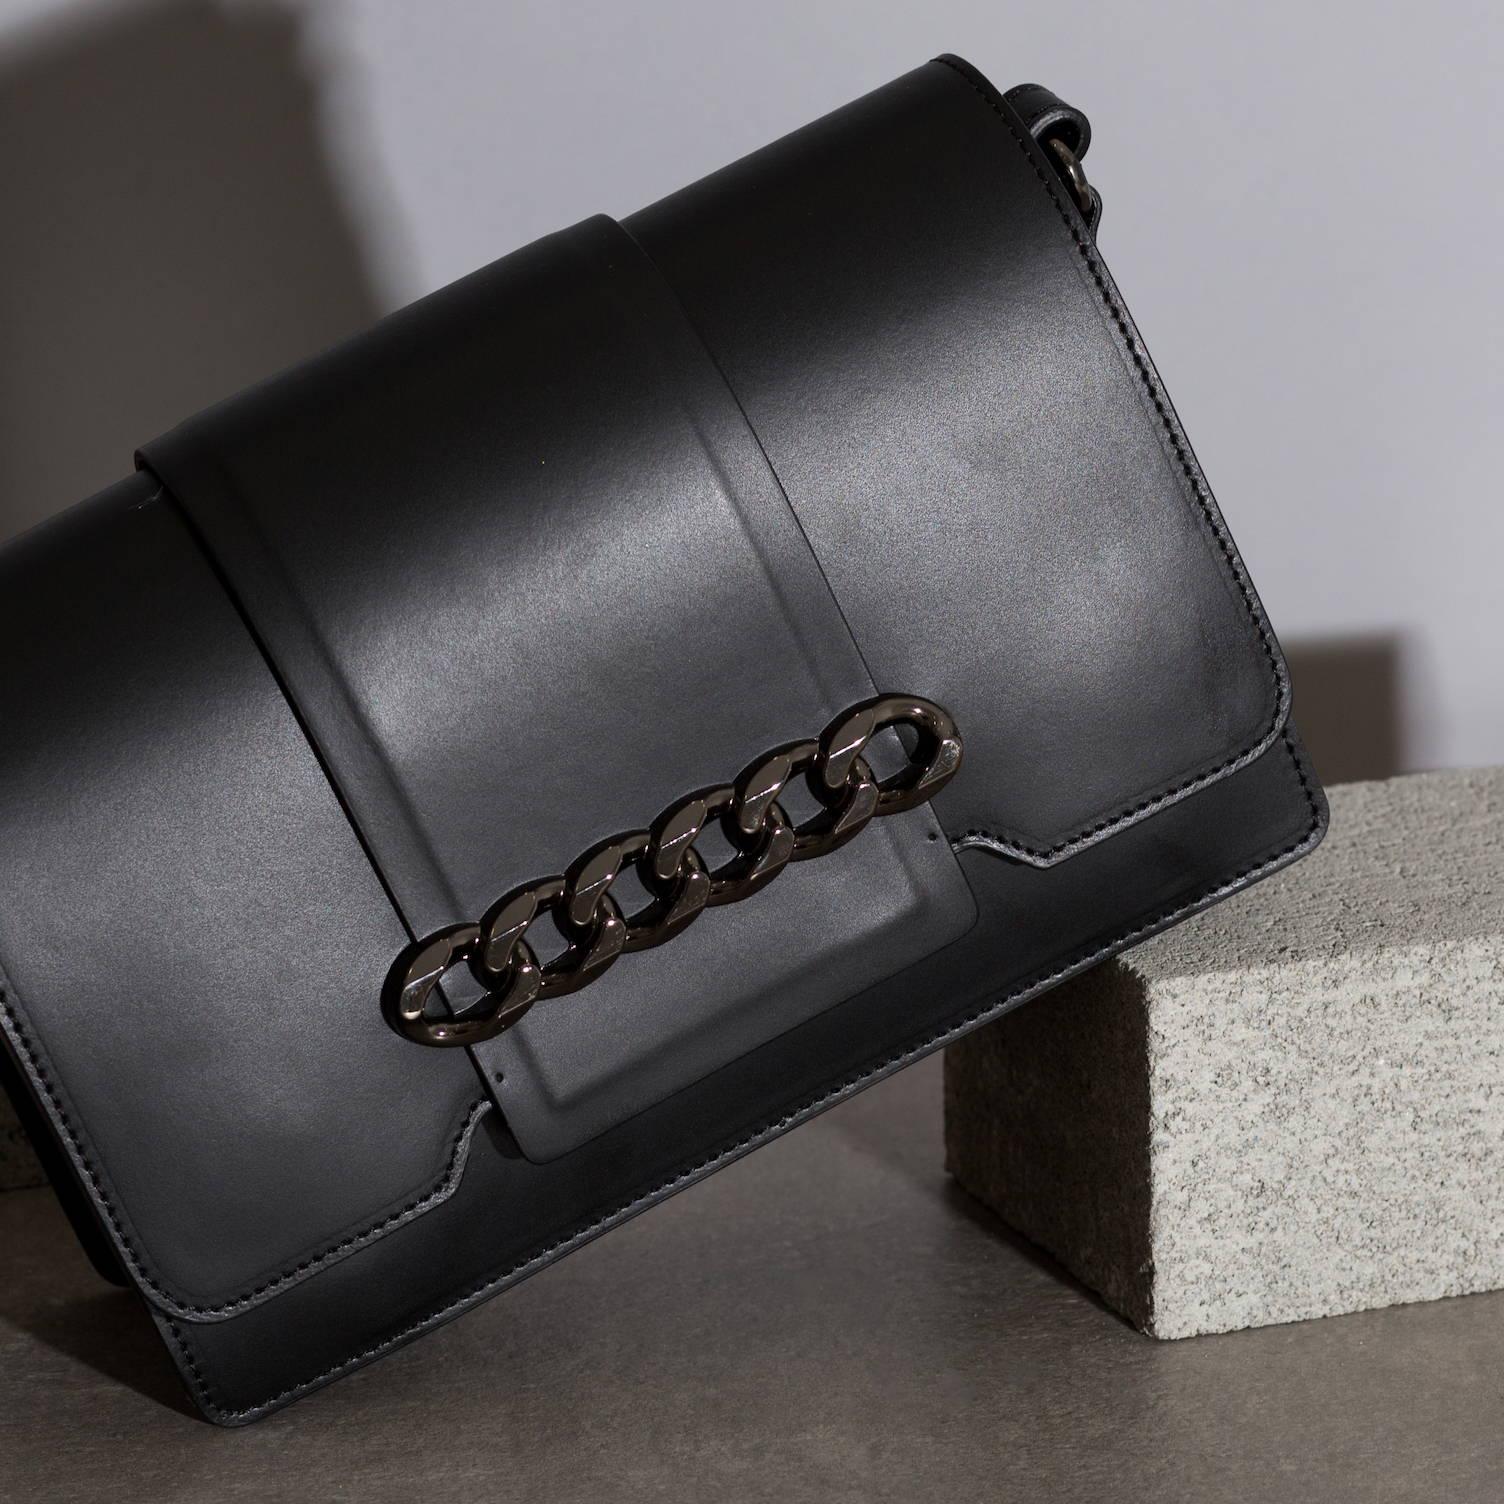 VESTIRSI leather handbag handmade in Italy ERIN crossbody purse bag in black smooth Italian leather with gunmetal chain detail